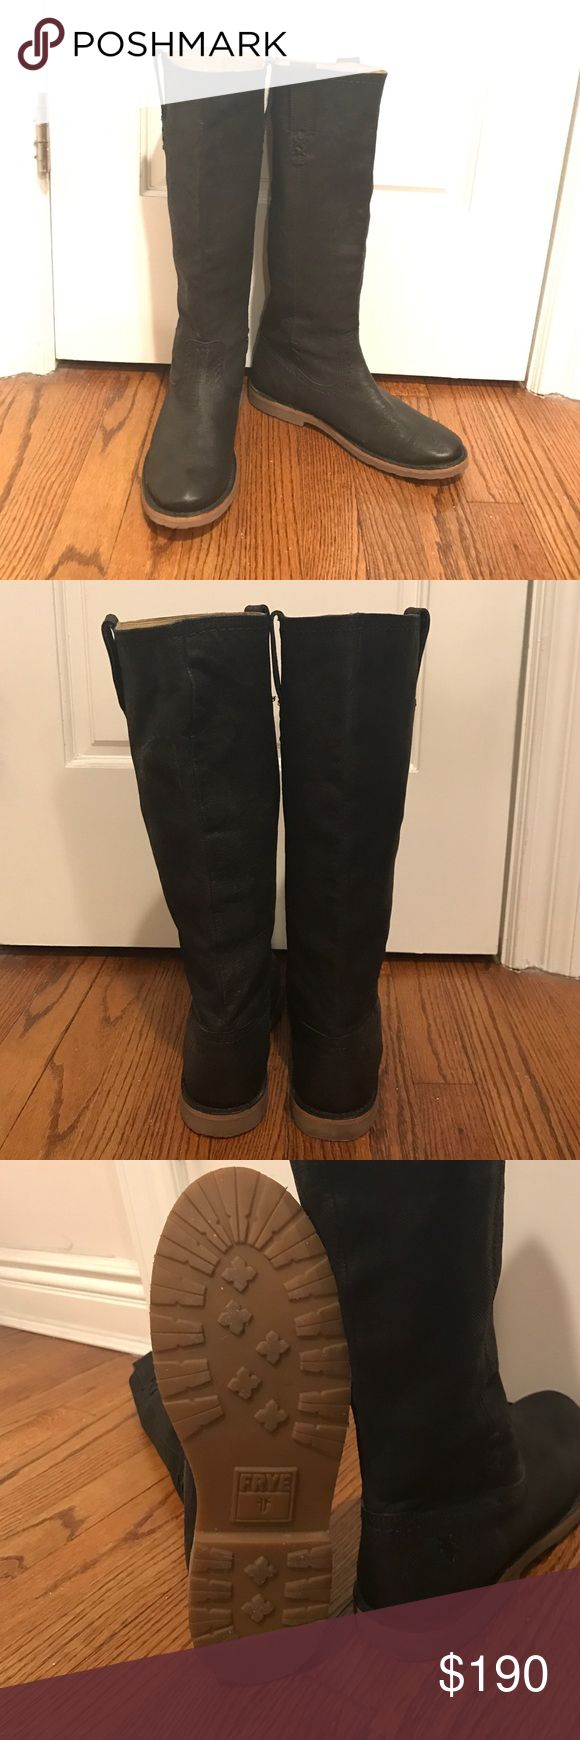 Selling this Frye Tall Riding boots on Poshmark! My username is: criistiinaa. #shopmycloset #poshmark #fashion #shopping #style #forsale #Frye #Shoes